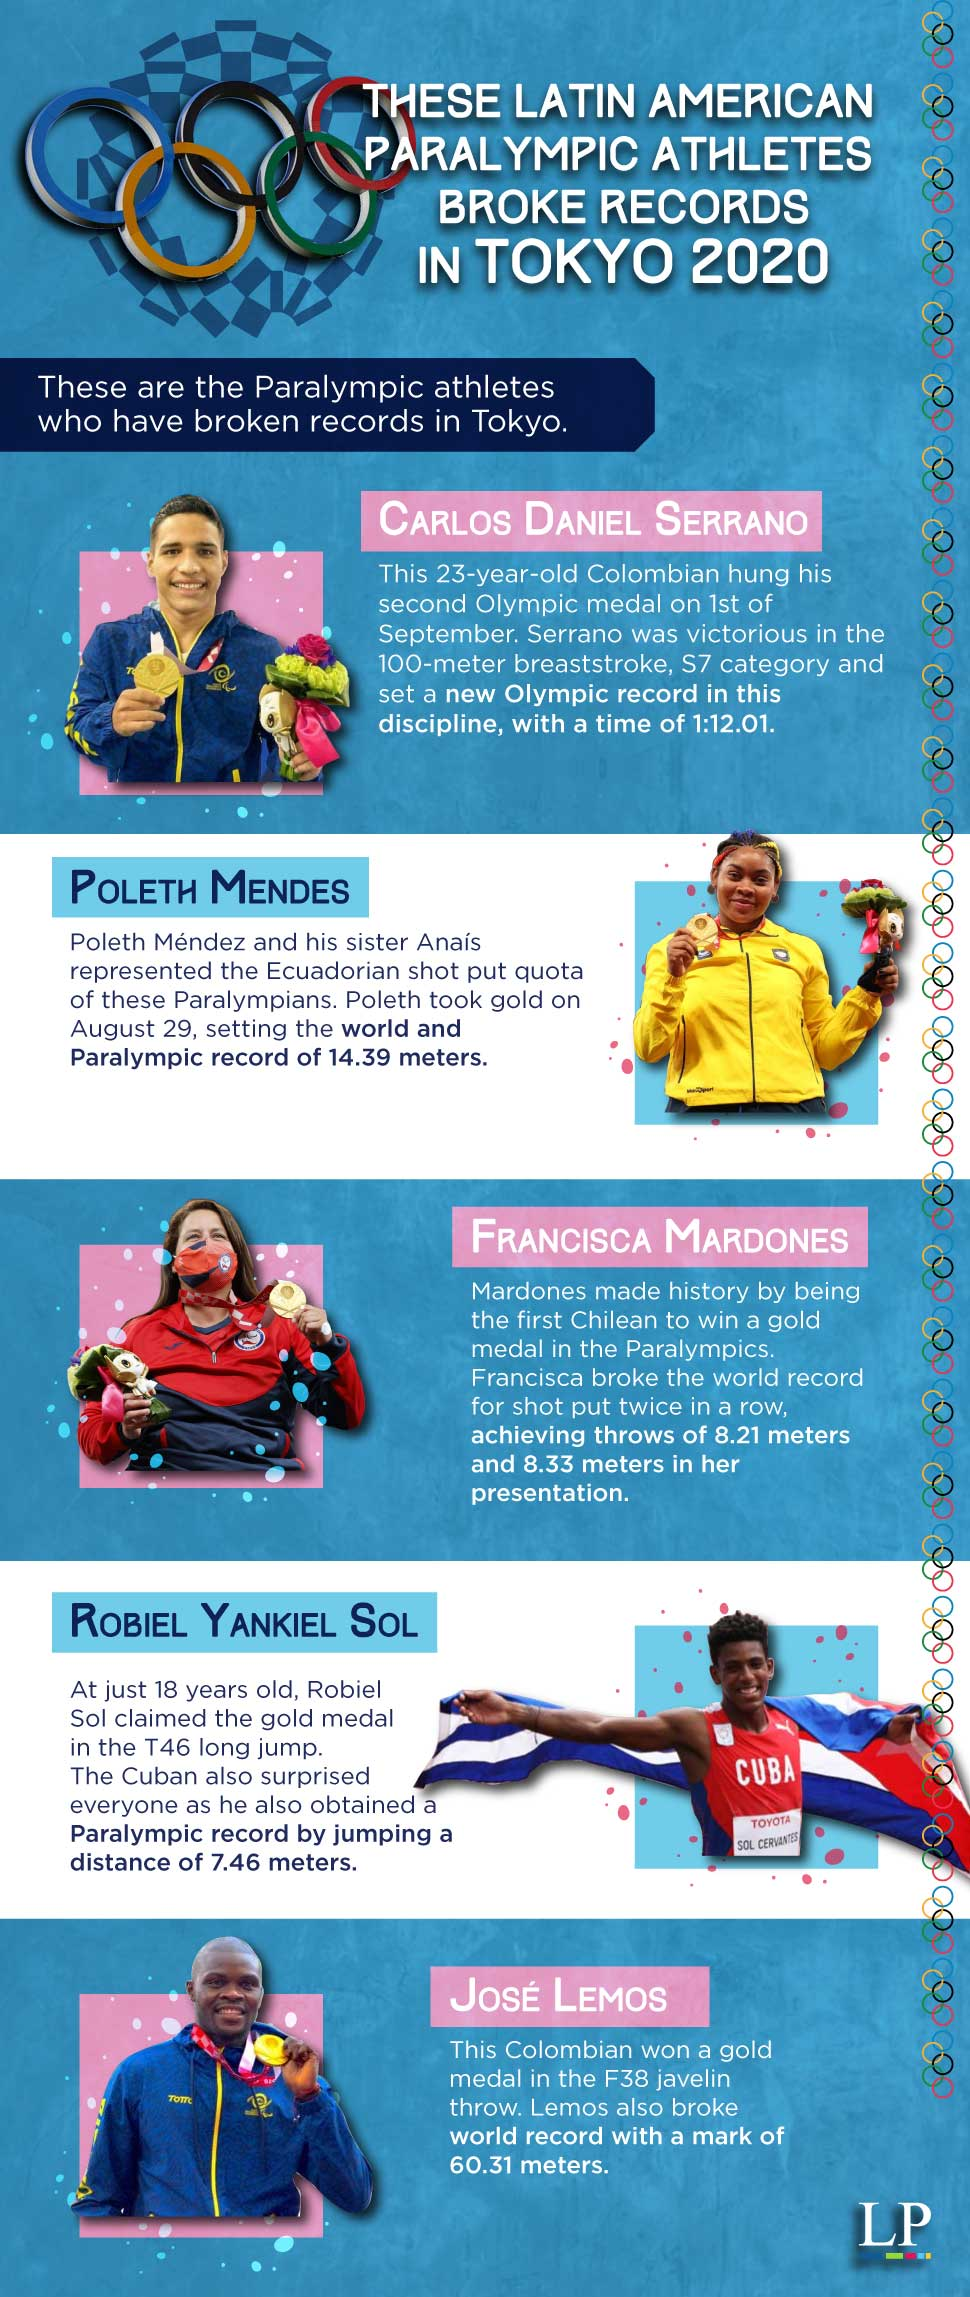 Latin Amercian Paralympic athletes